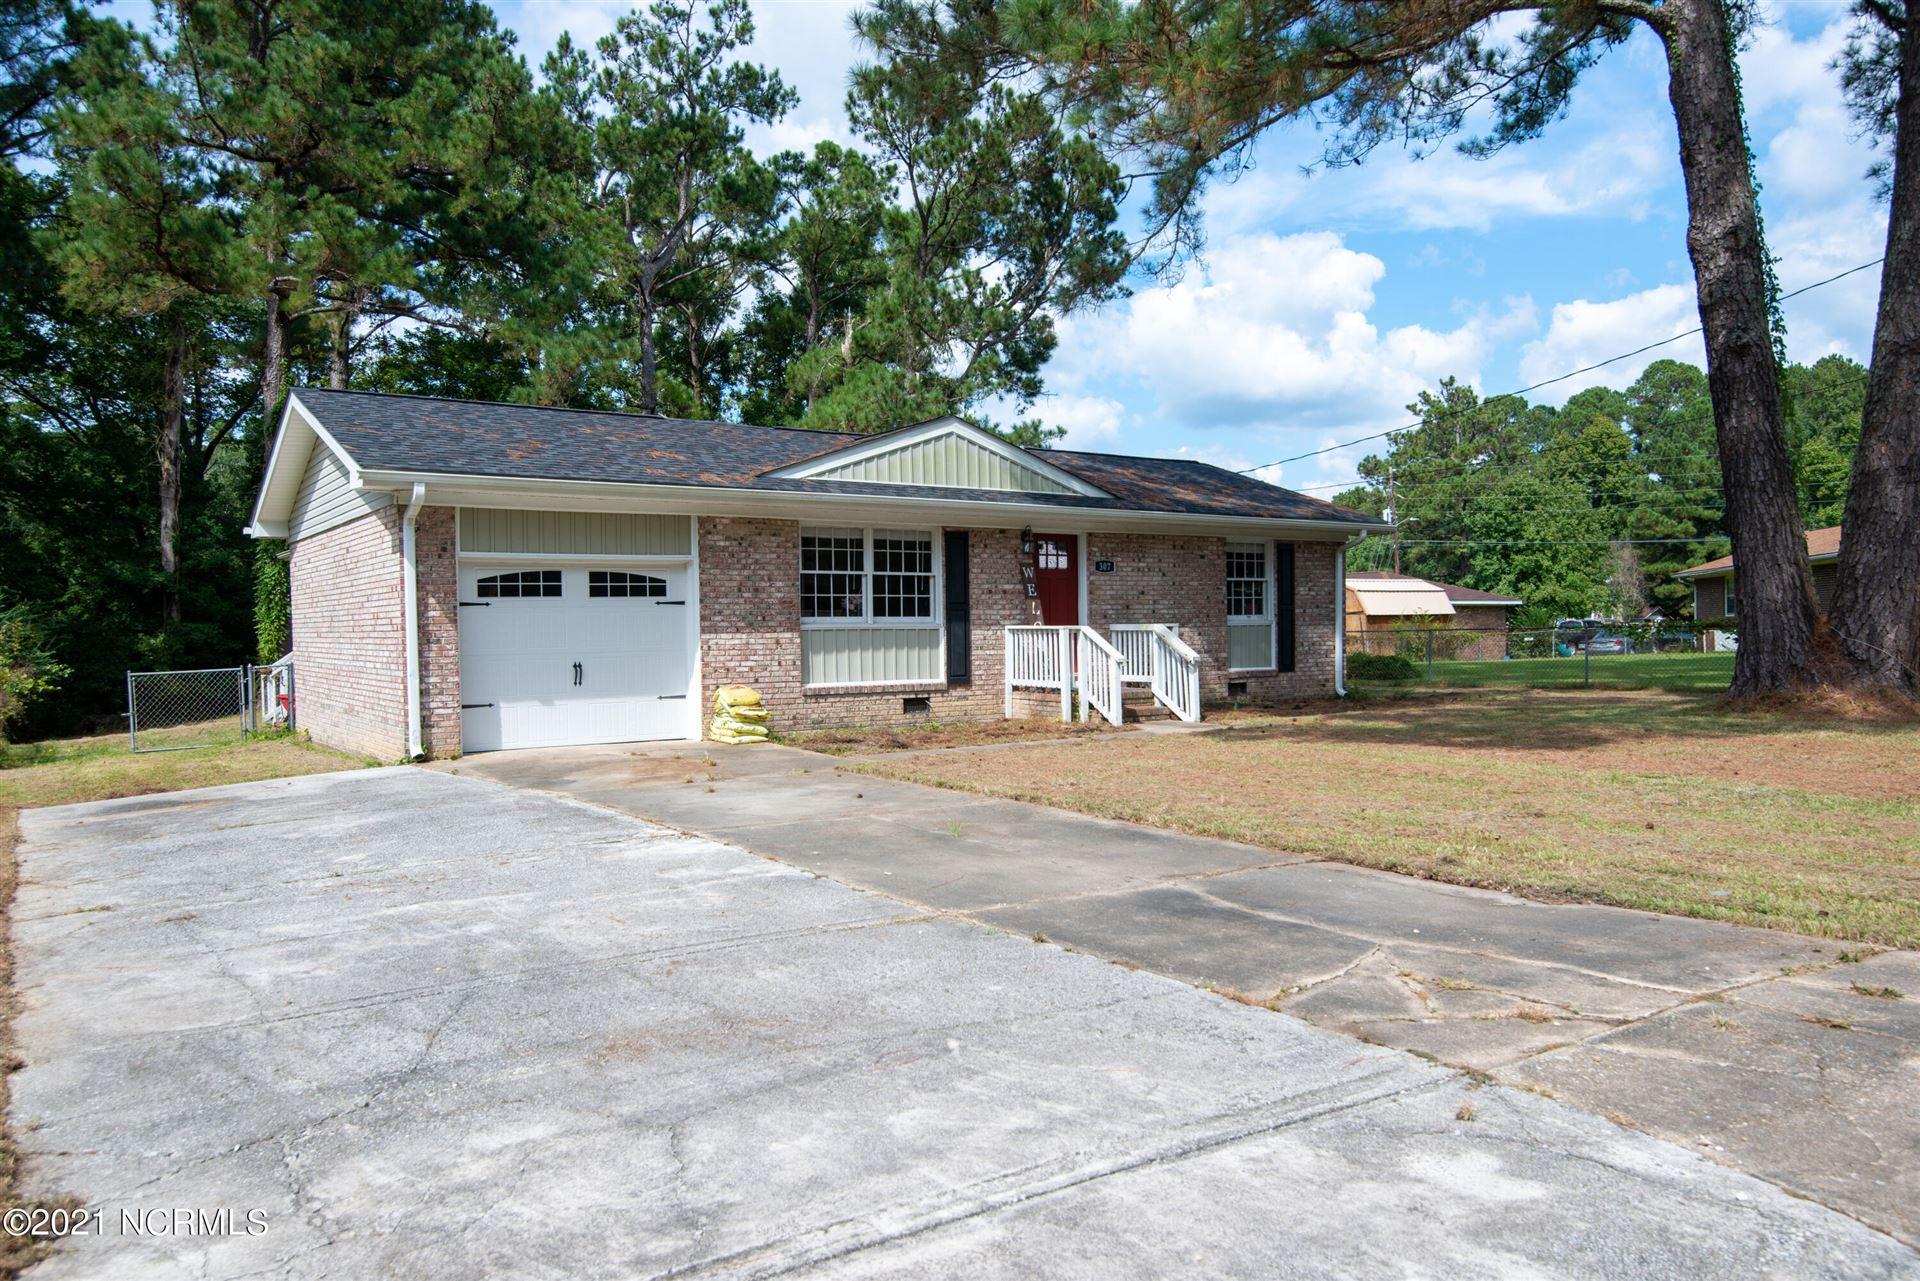 Photo of 307 Cardinal Road, Jacksonville, NC 28546 (MLS # 100293525)